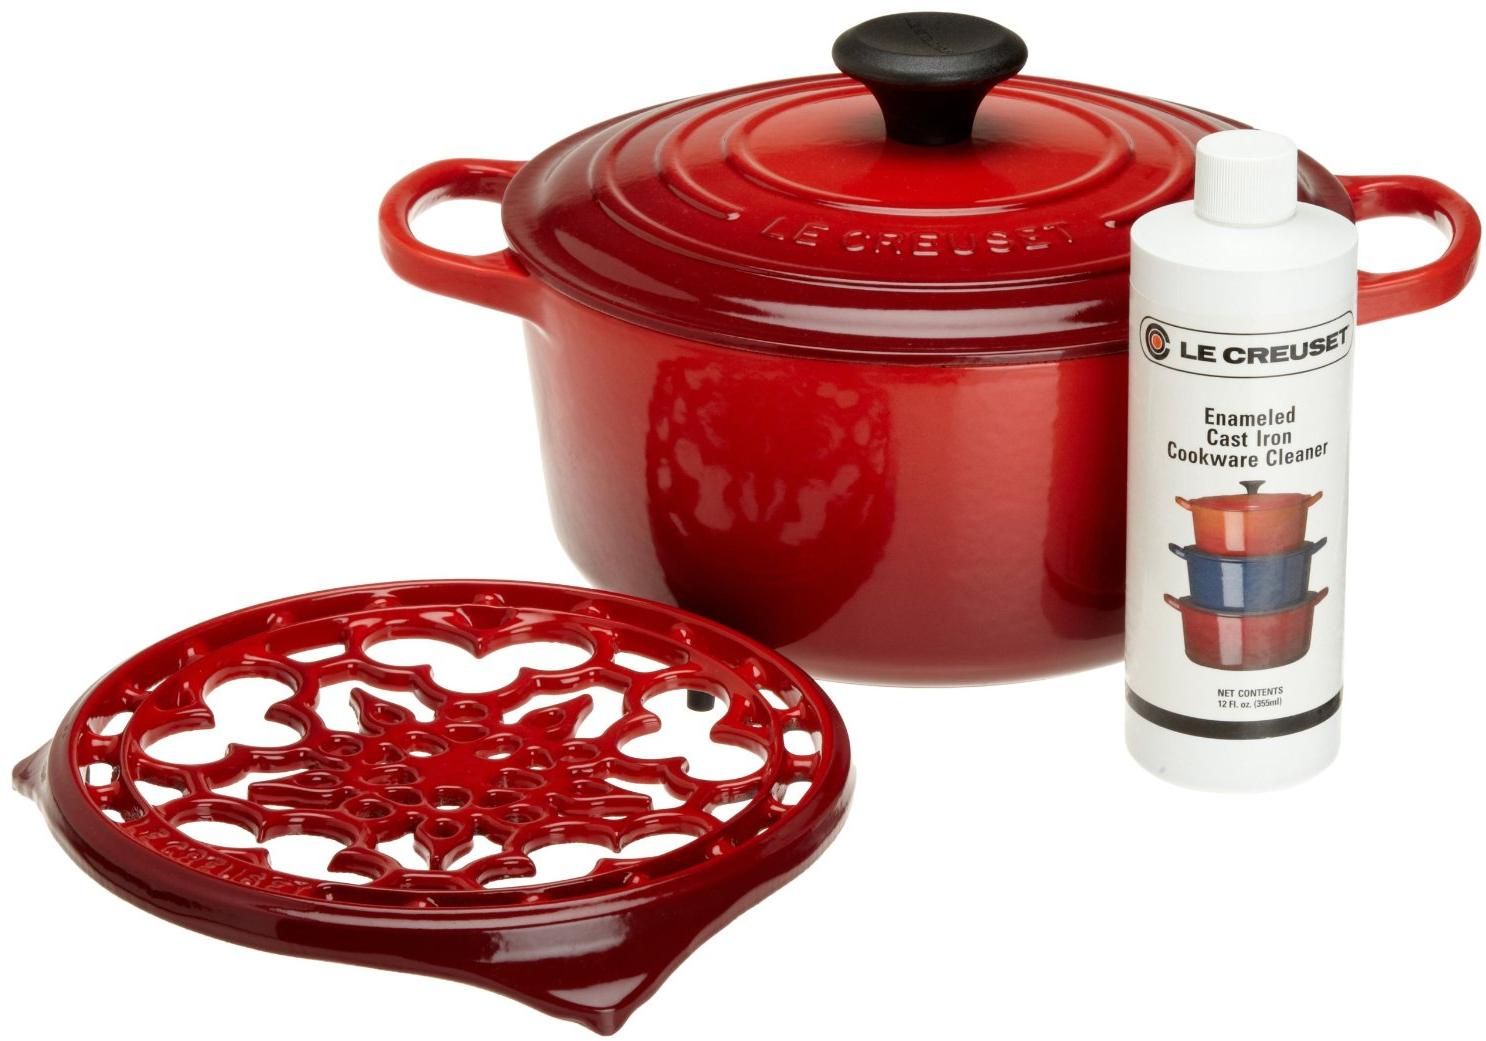 Le Creuset 4 Piece Cherry Cast Iron Cookware Gift Set